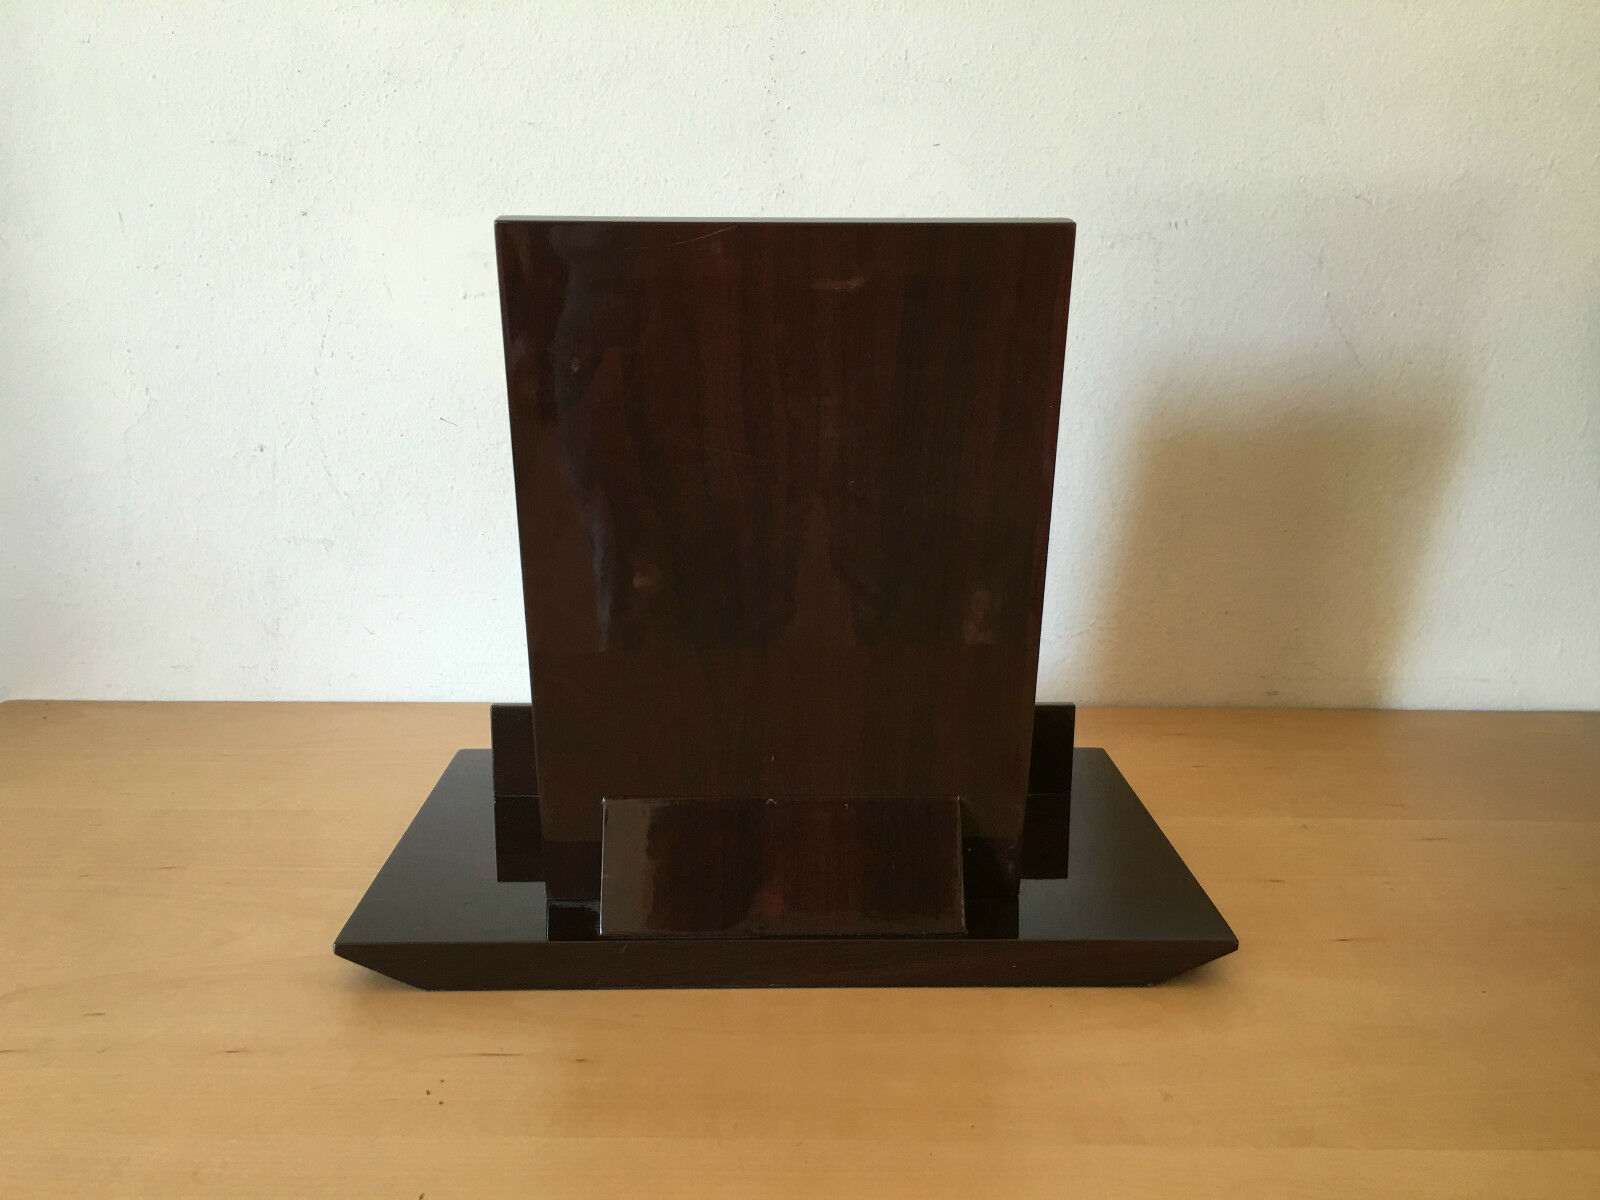 Used Used Used - Catalogs Expositor LONGINES - Wood   Madera - 27 x 17 x 22 cm  Usado b618f8